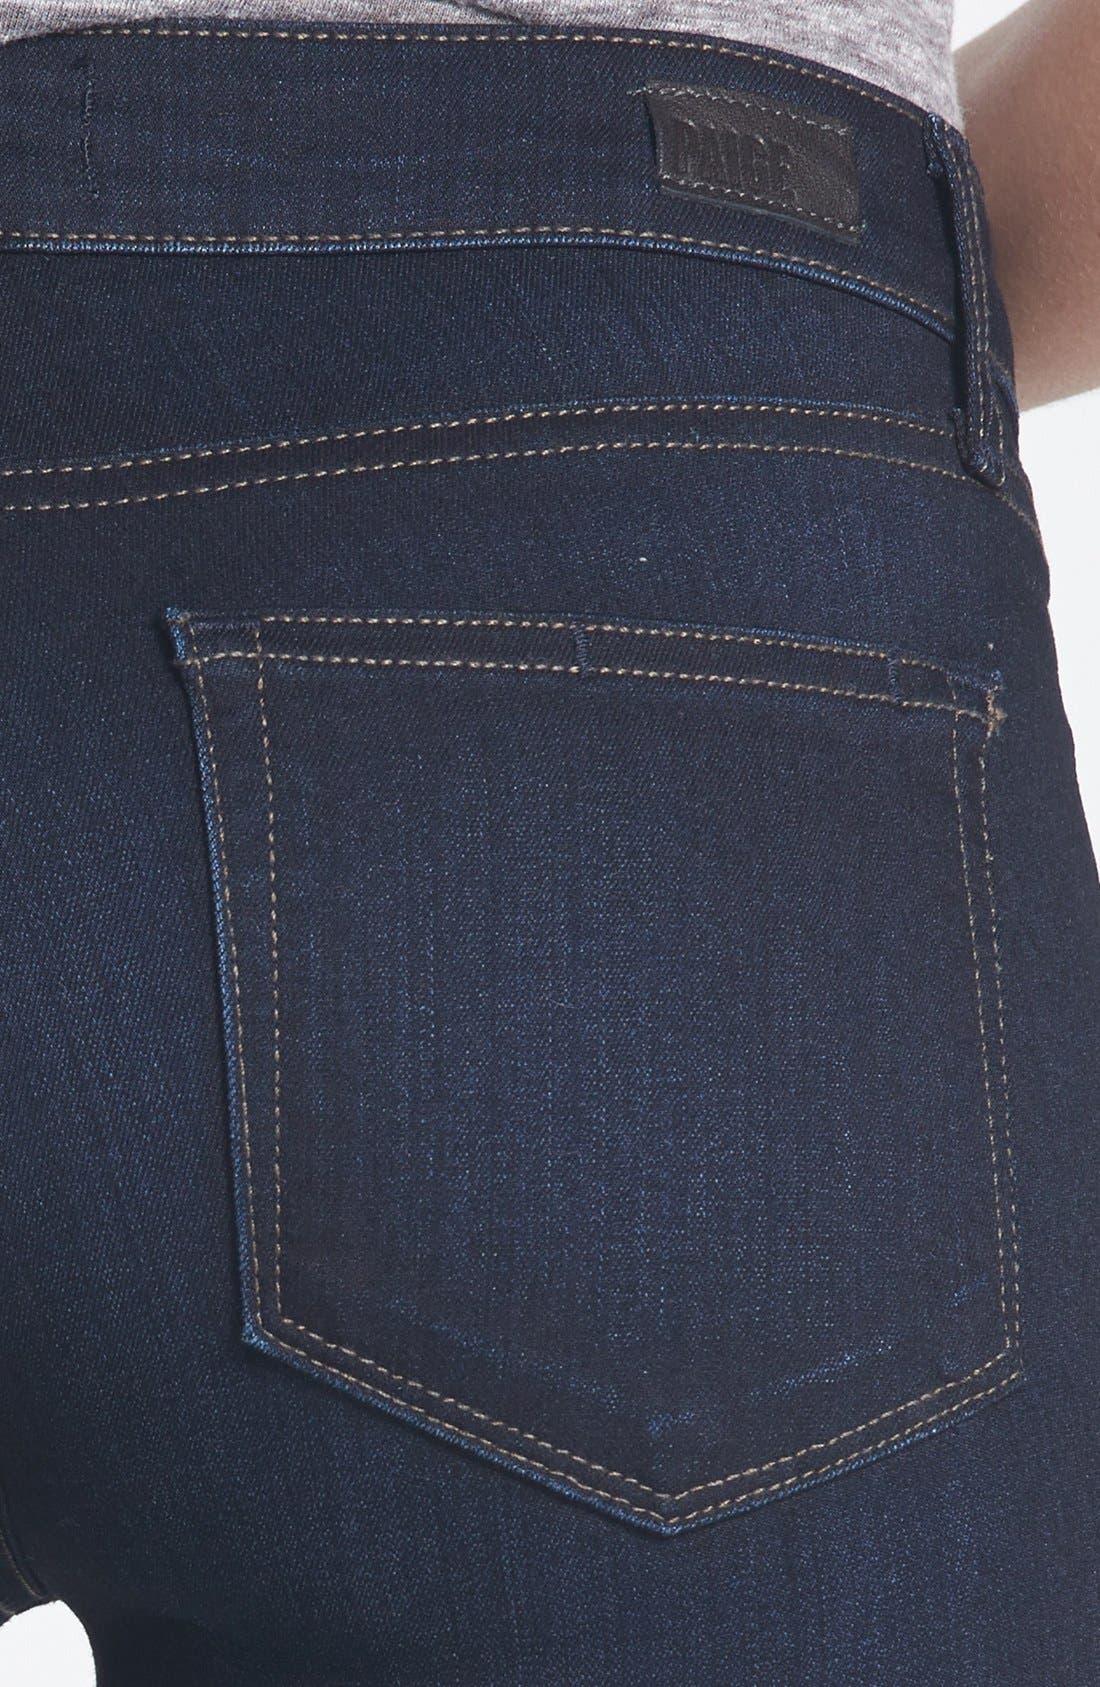 Alternate Image 3  - PAIGE 'Transcend - Skyline' Skinny Jeans (Mona)